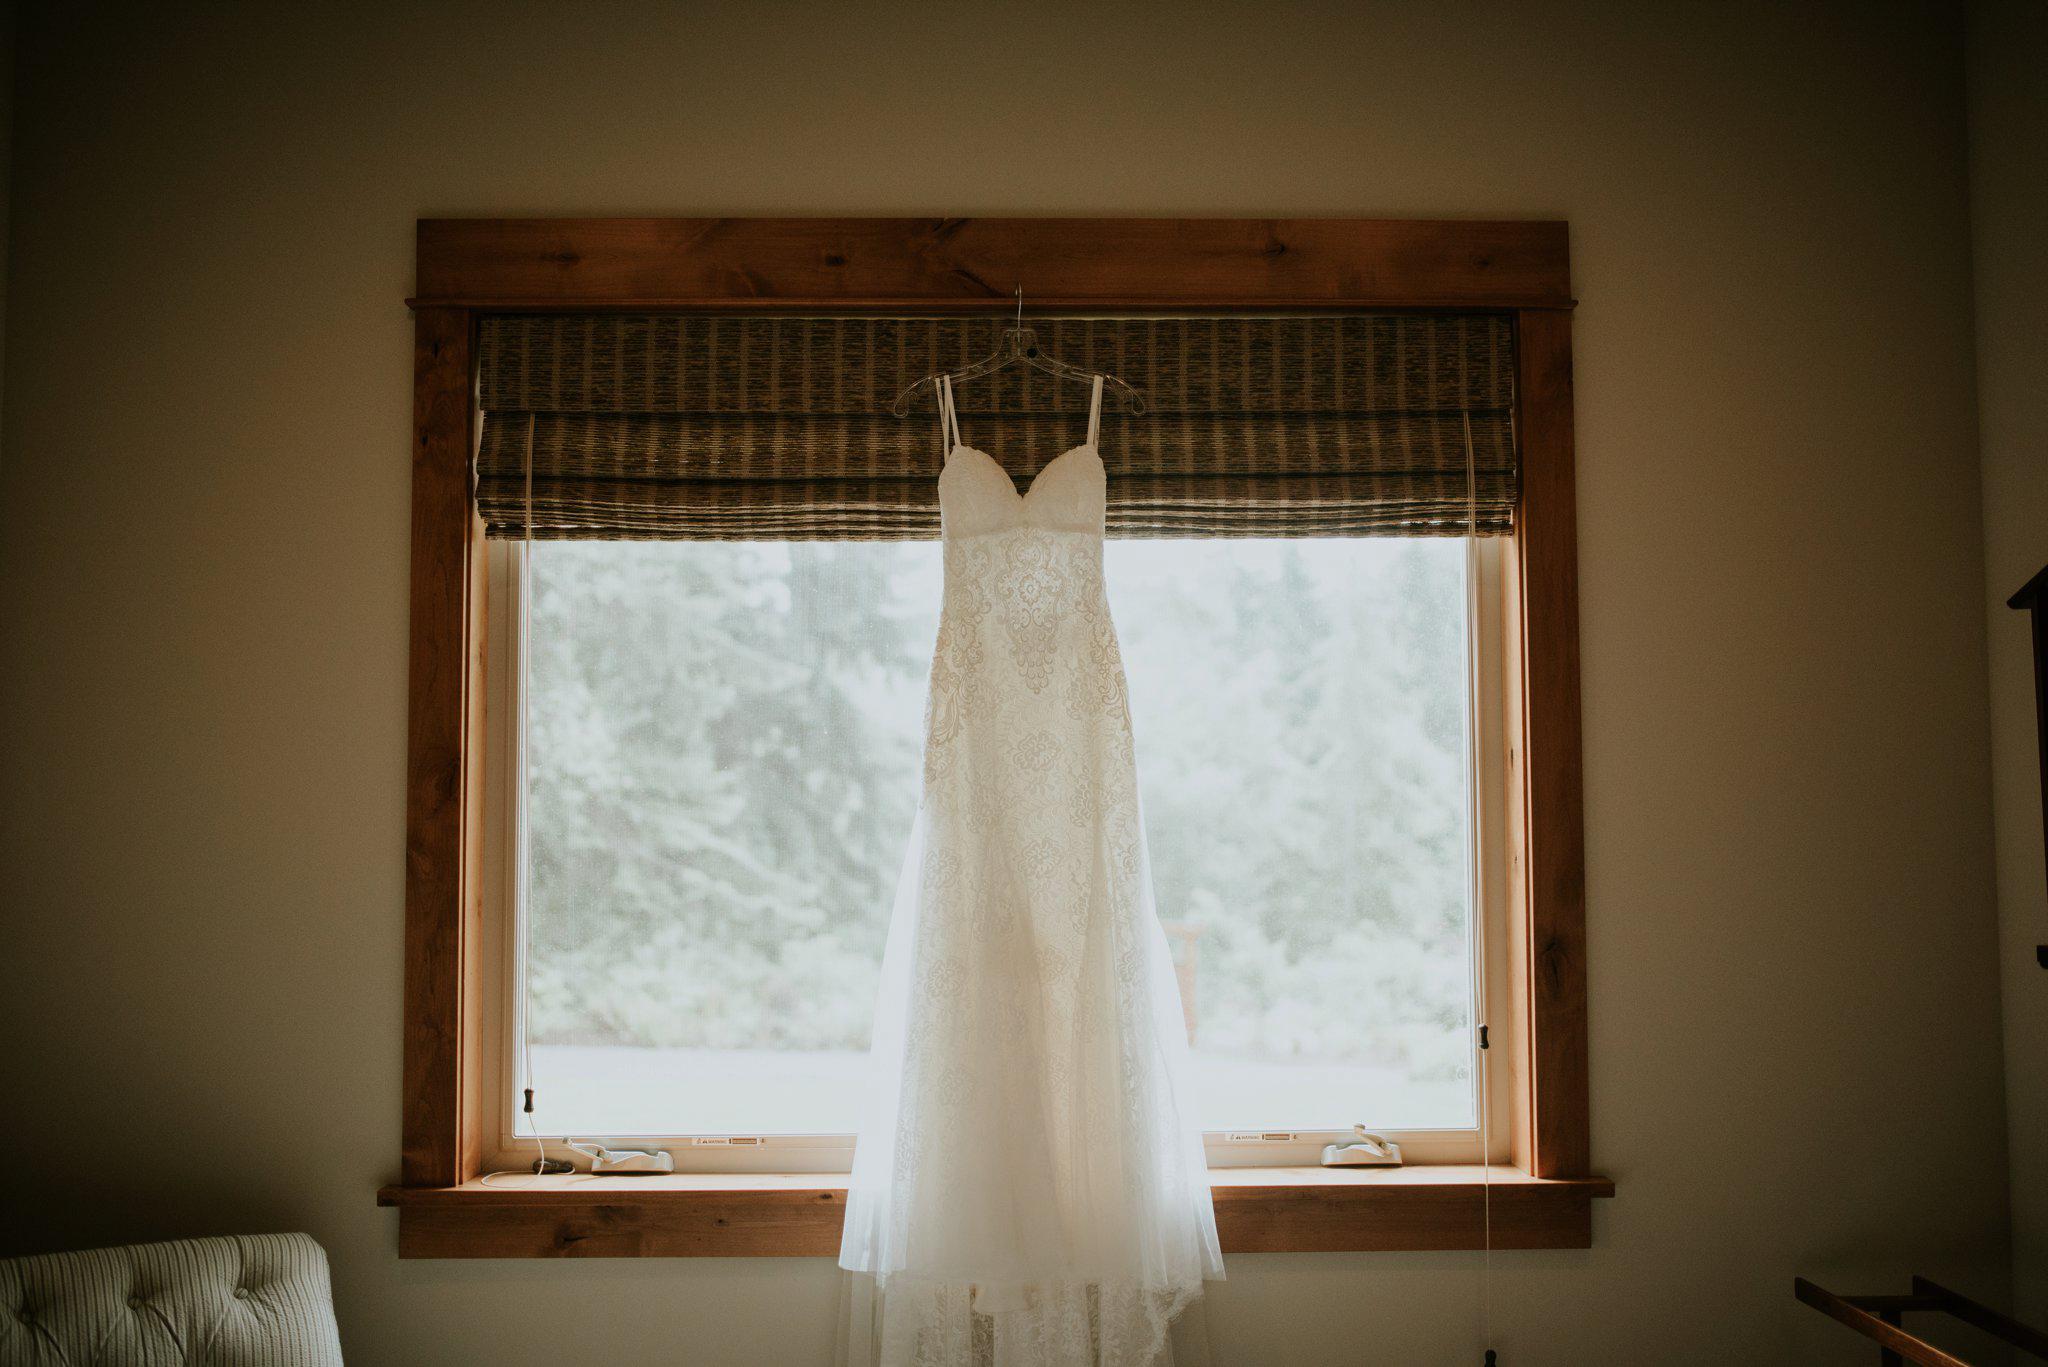 hollywood-school-house-wedding-seattle-photographer-caitlyn-nikula-6.jpg